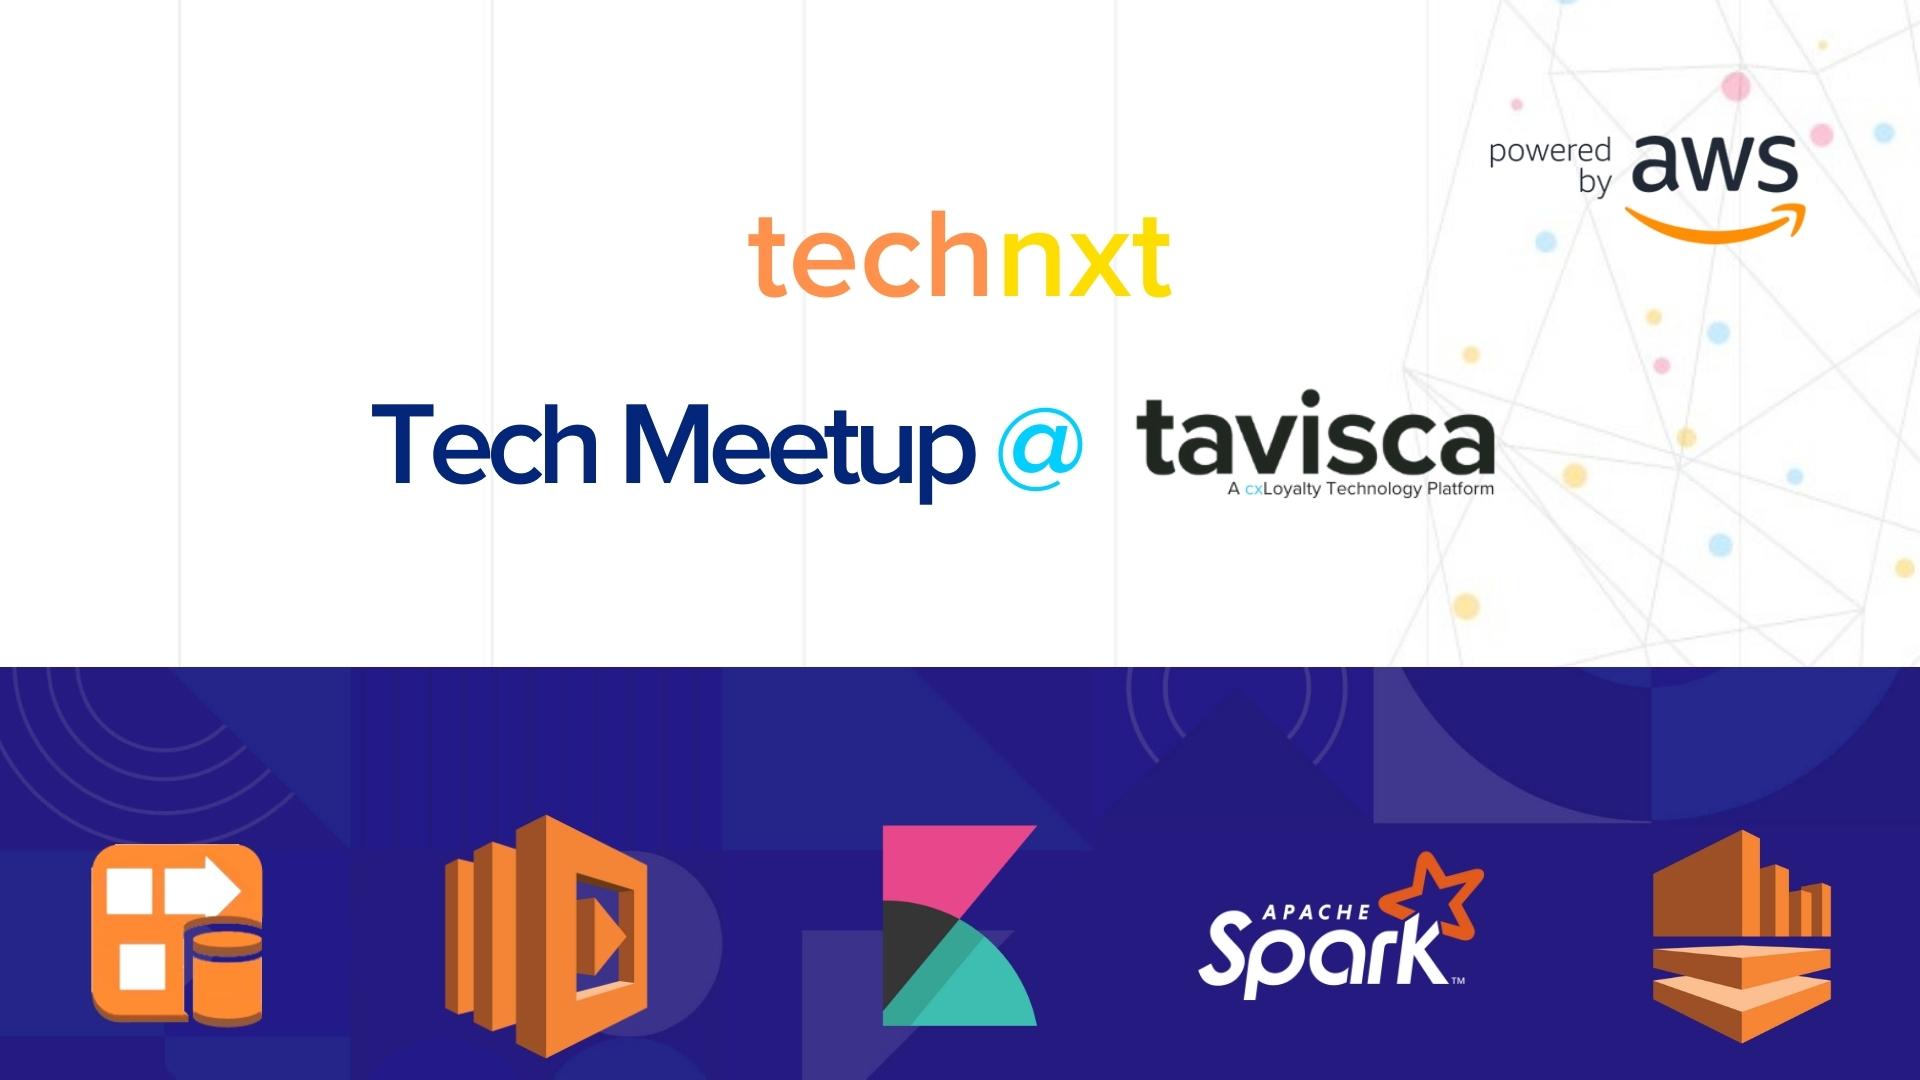 Tavisca Solutions to Host TechNxt Meetup at Pune office